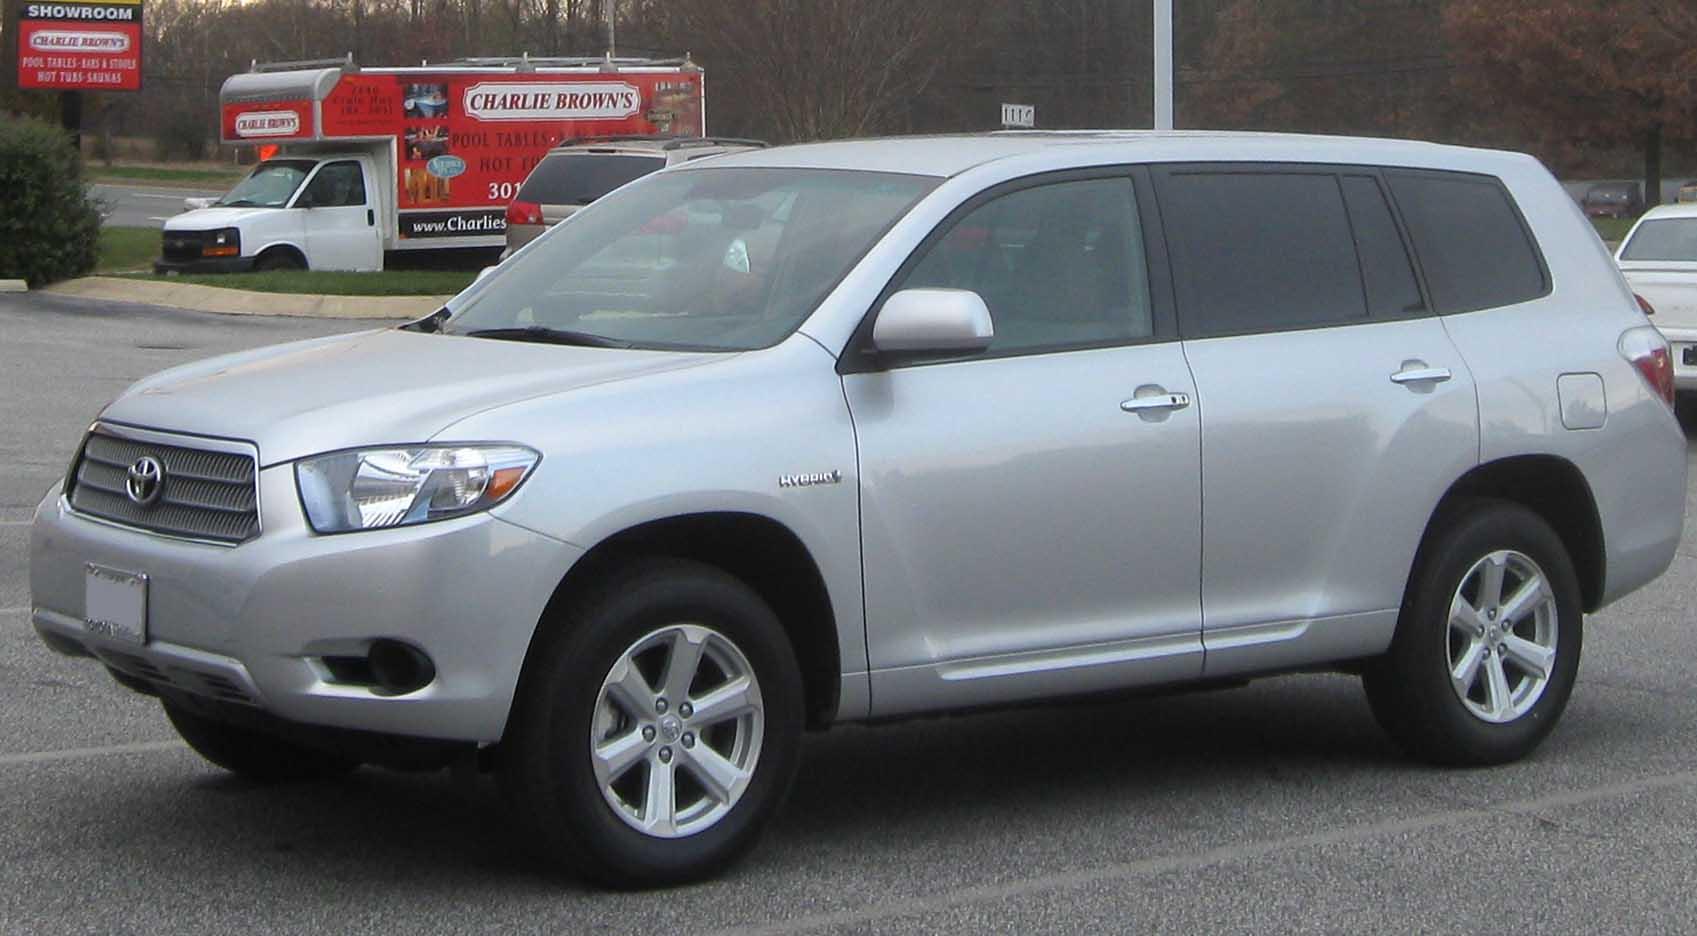 File:2nd Toyota Highlander Hybrid.jpg - Wikipedia, the free ...